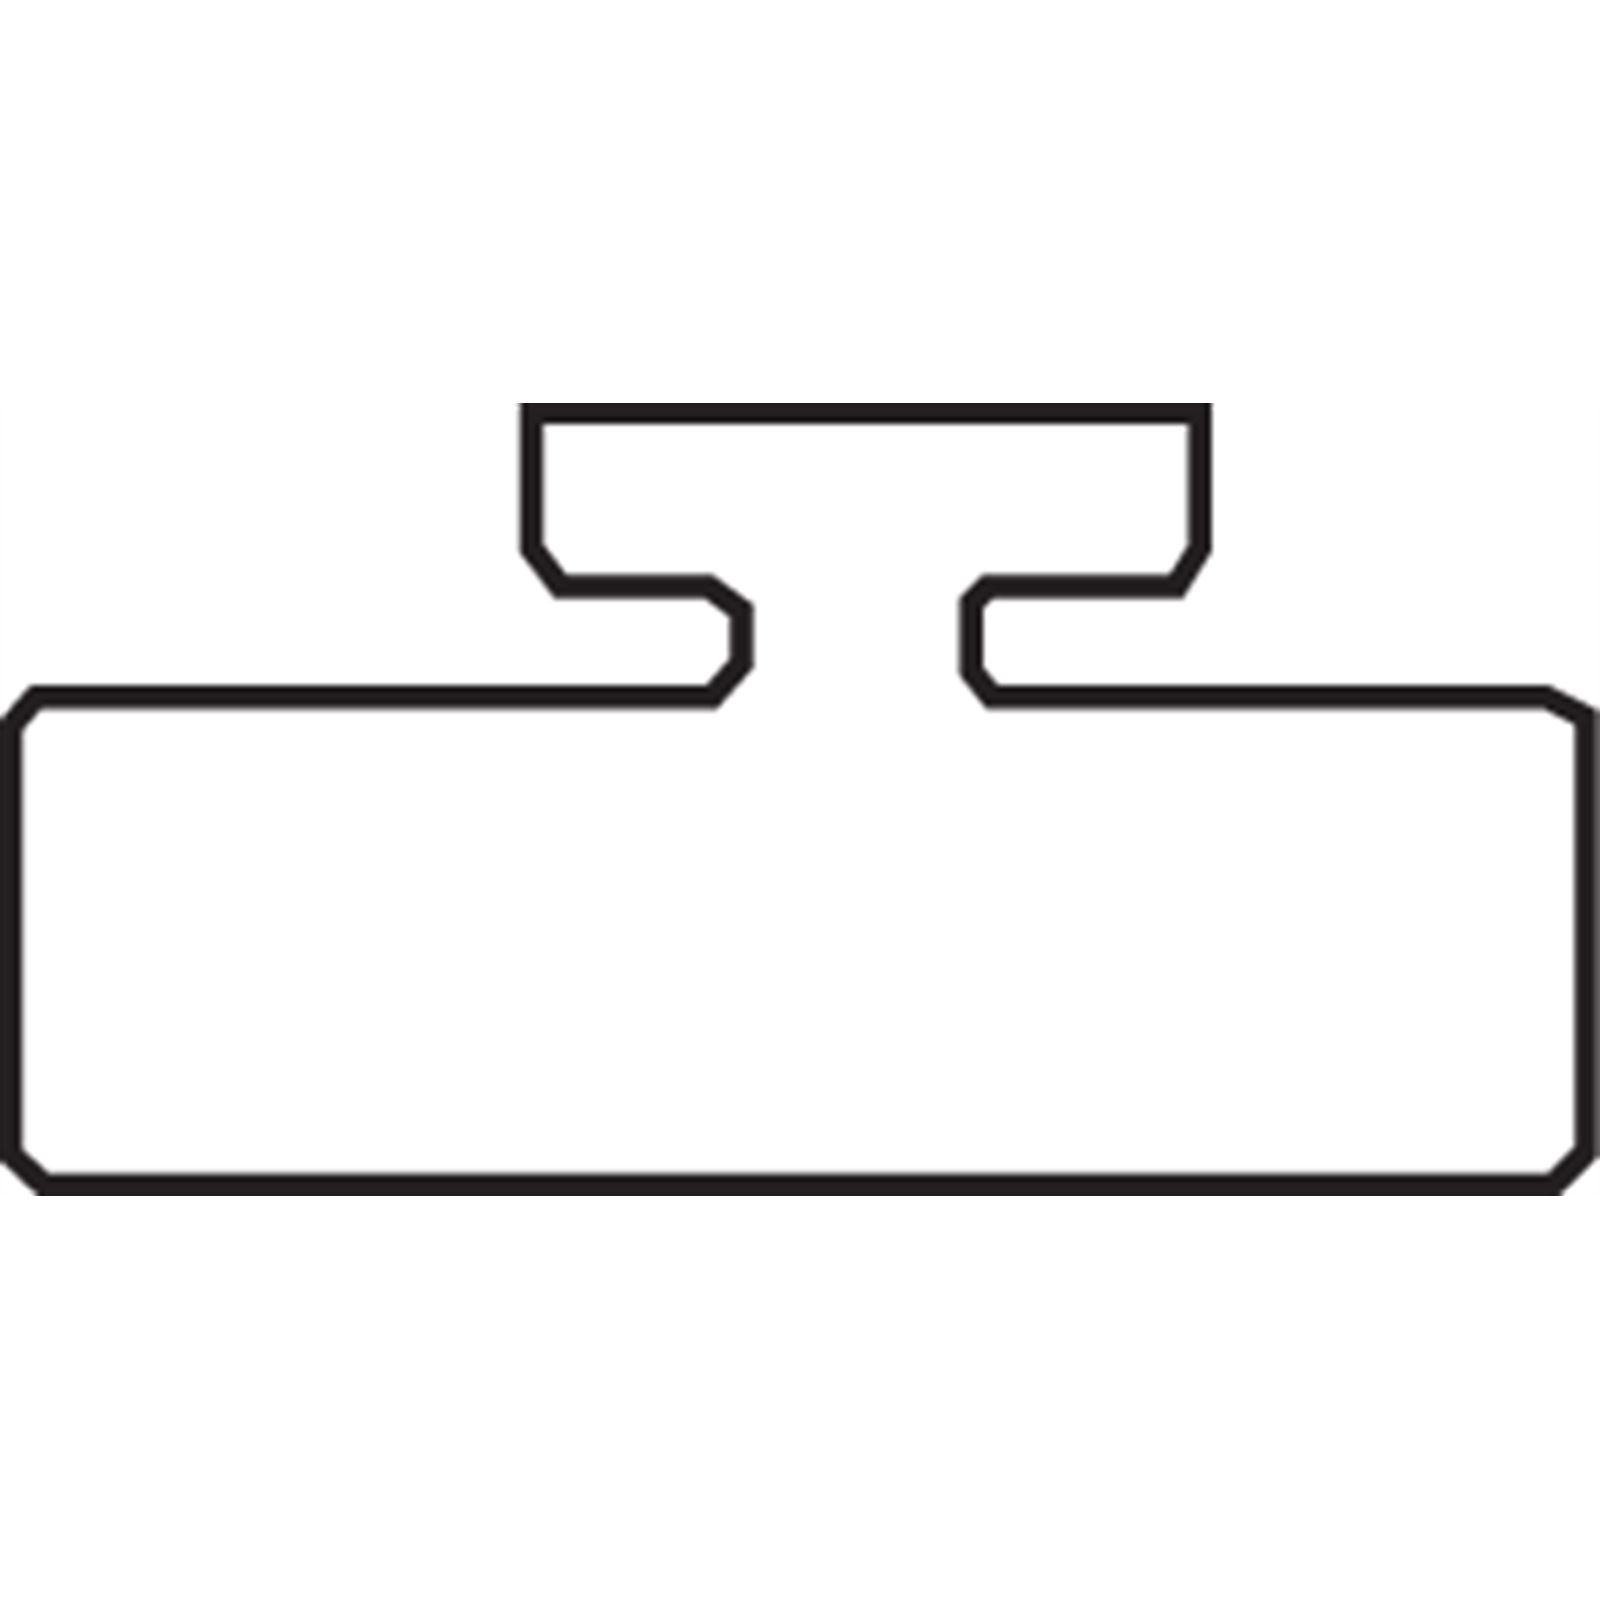 "Garland Black Replacement Slide - UHMW - Profile 14 - Length 47.75"" - Kawasaki"